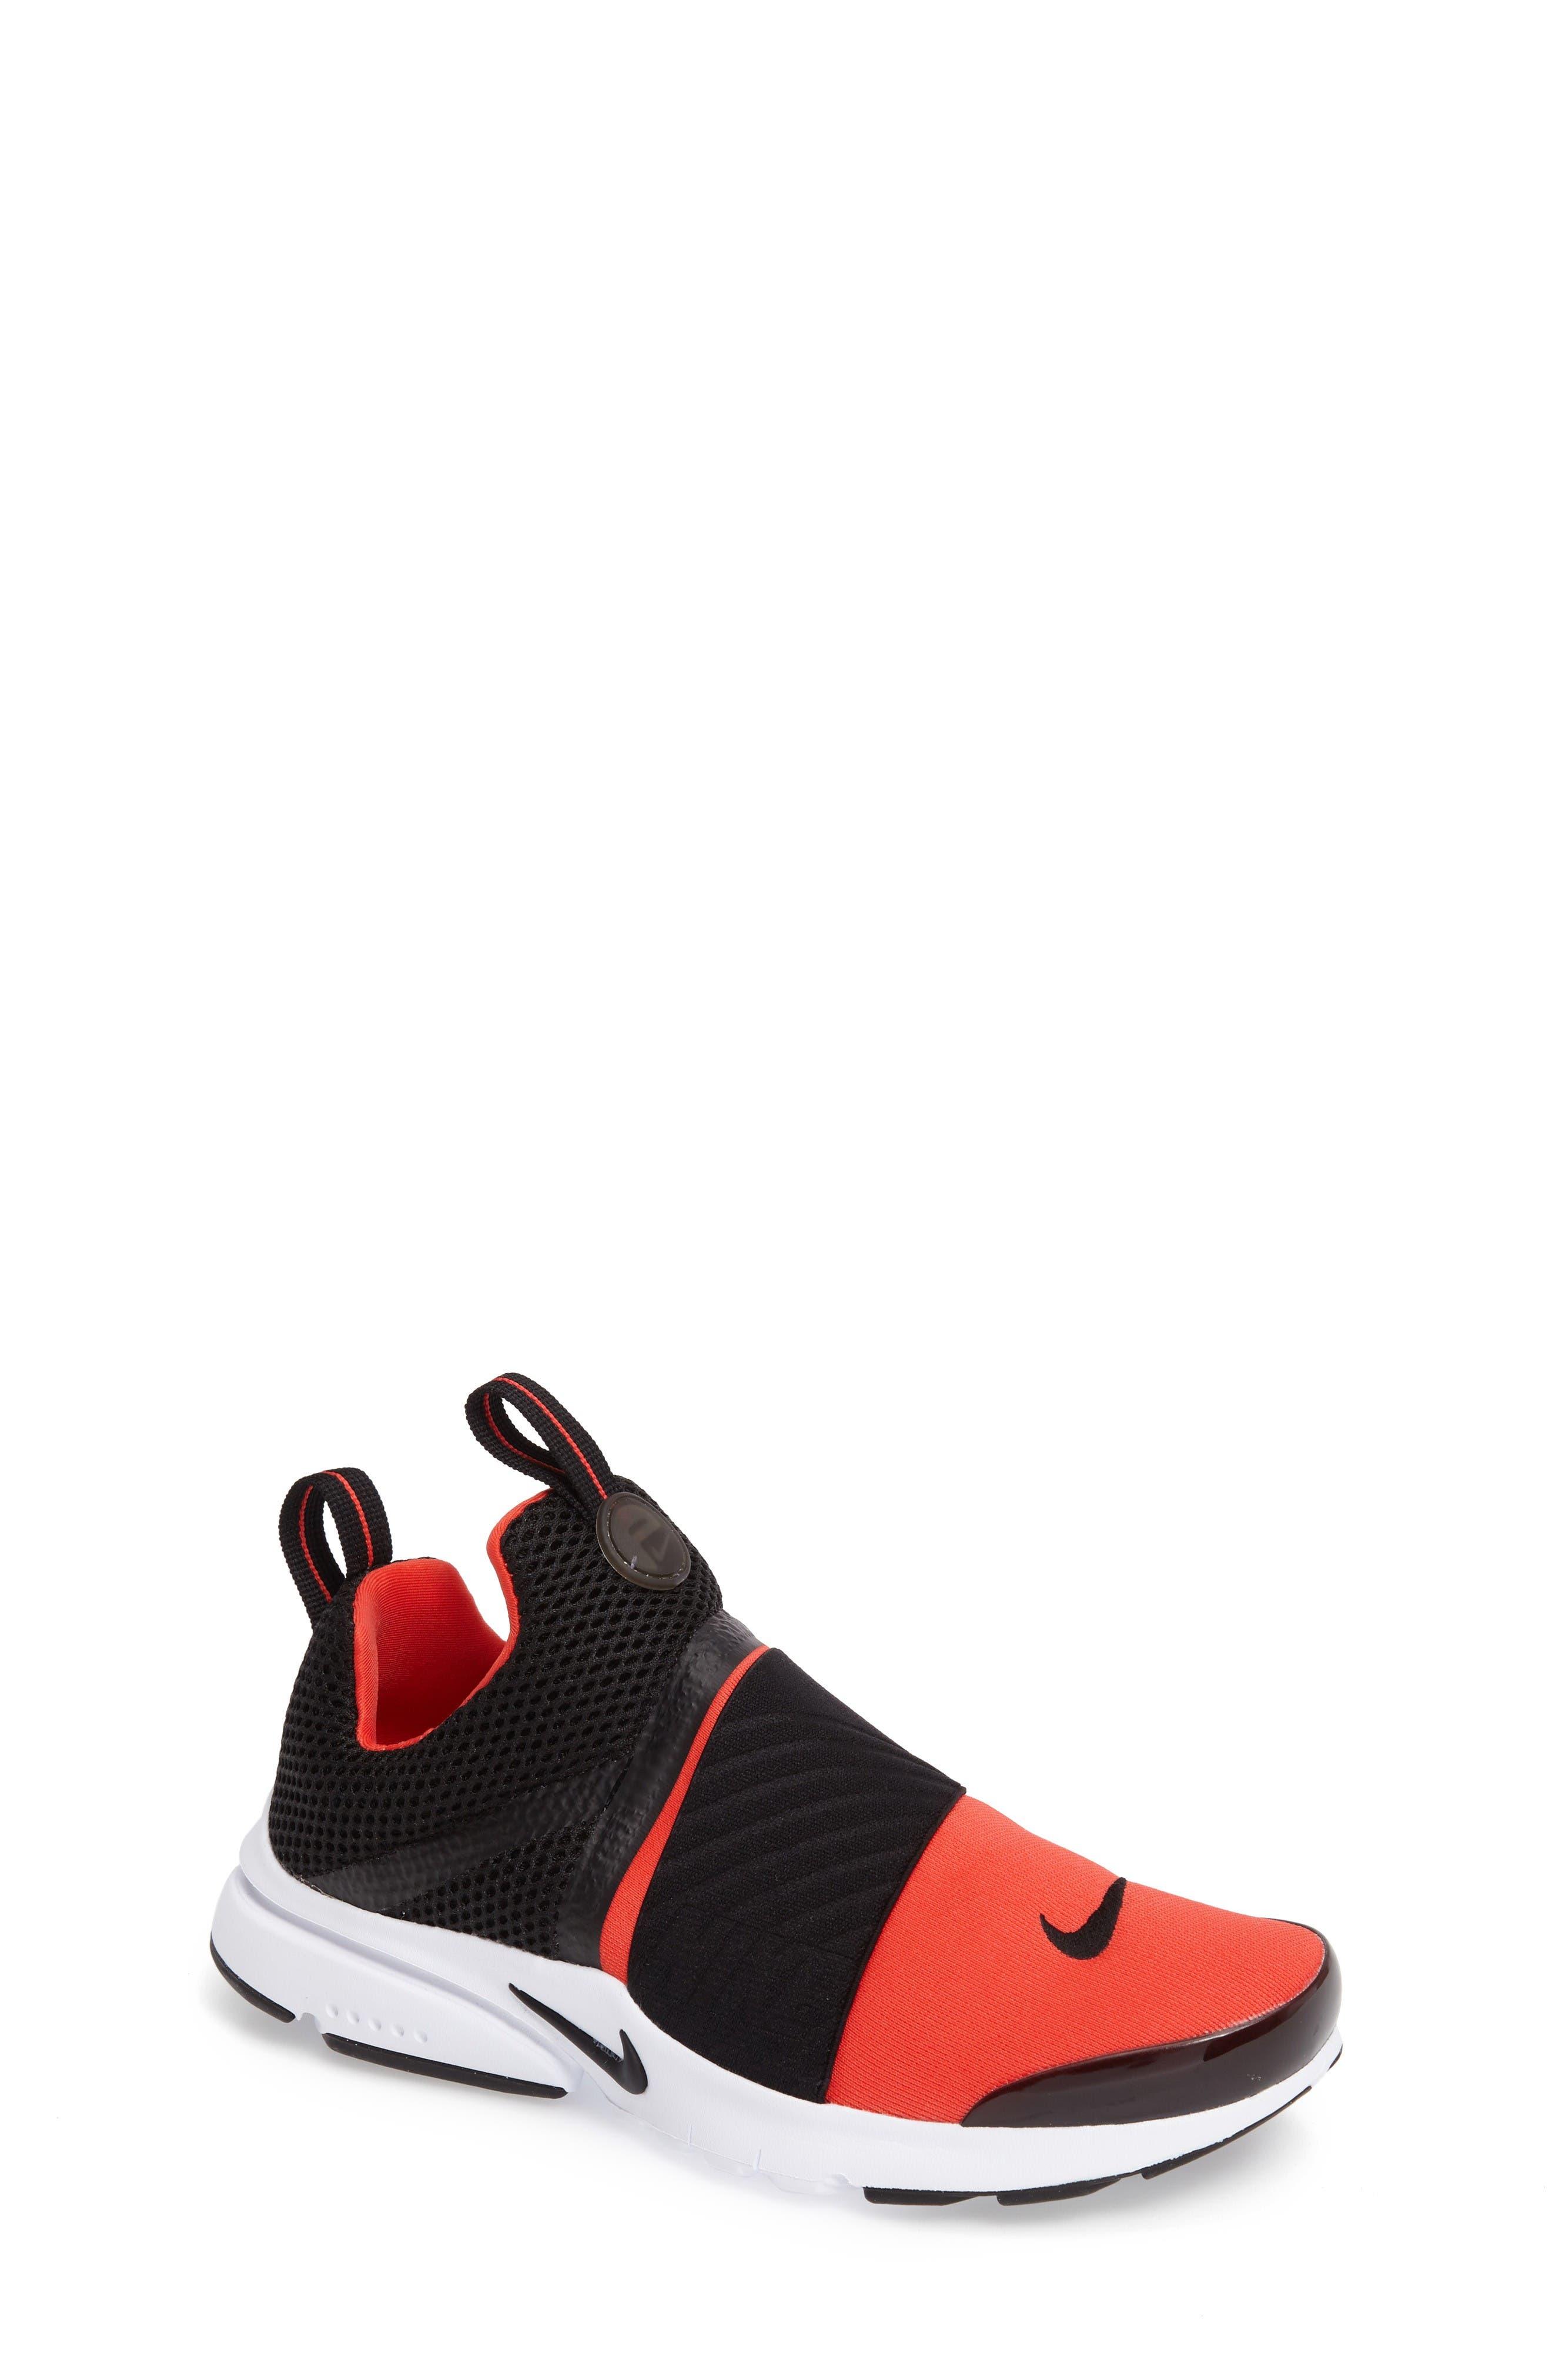 Nike Presto Extreme Sneaker (Big Kid)